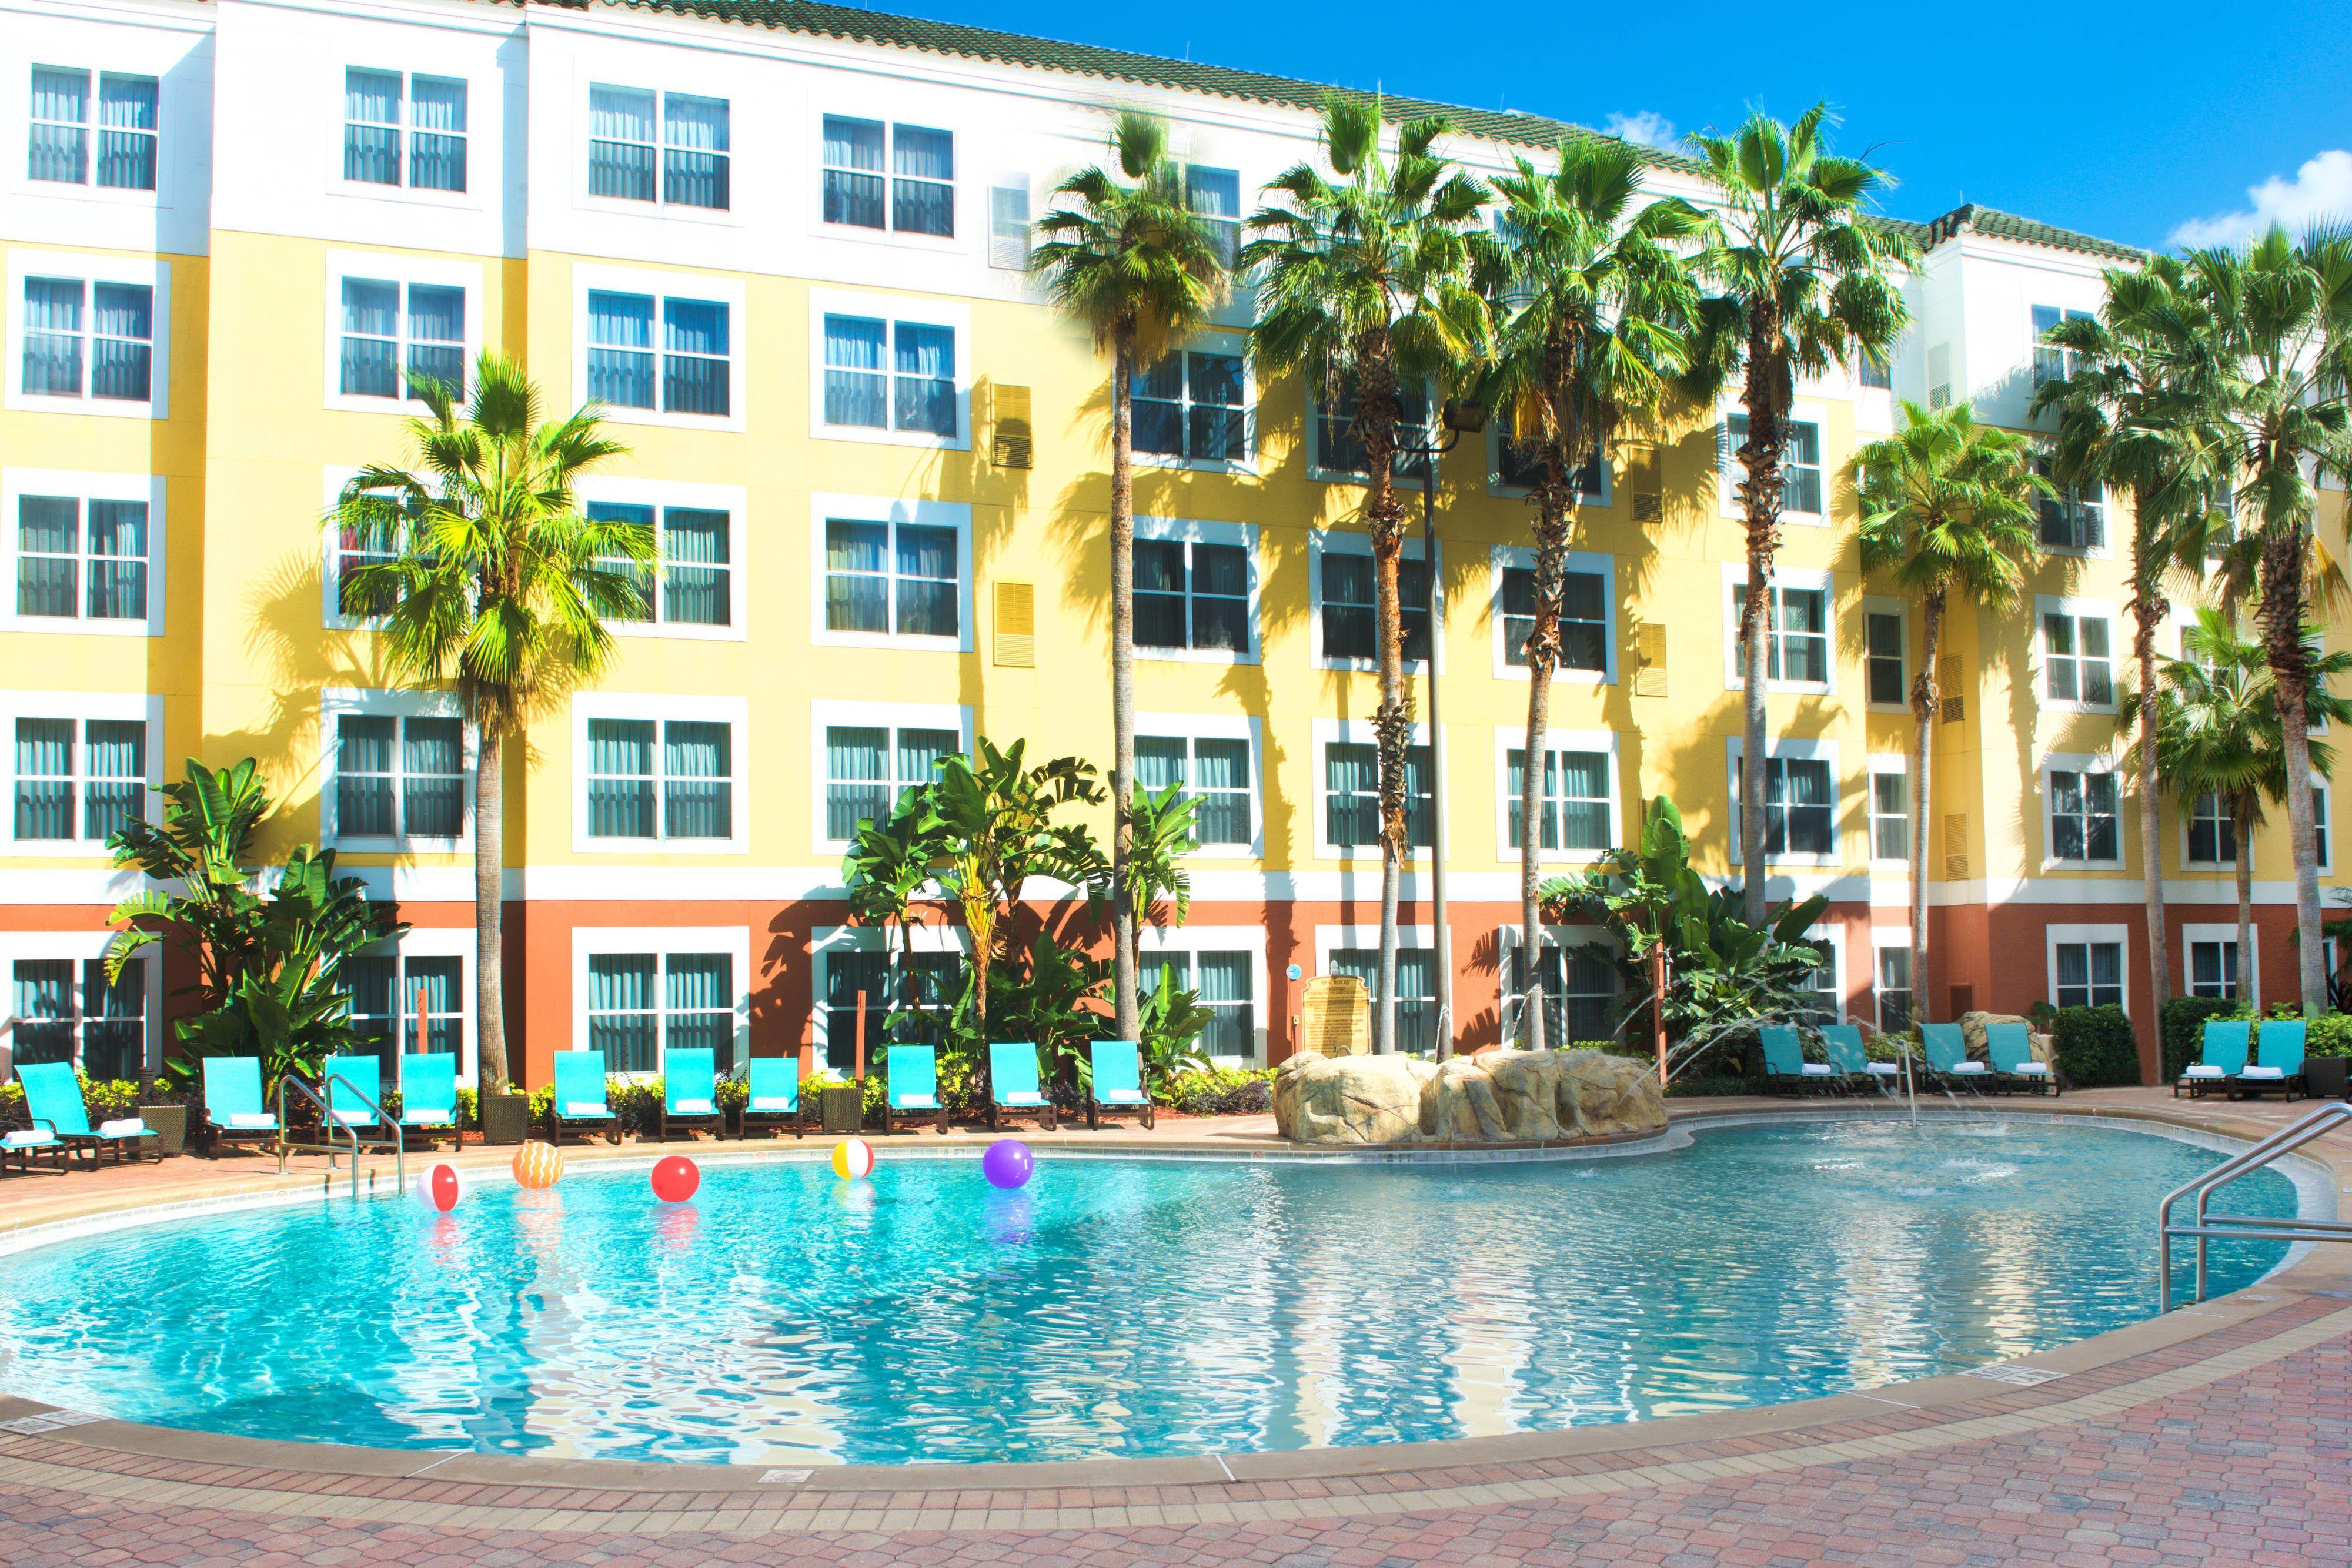 Residence Inn Orlando Lake Buena Vista Outdoor Pool Visiting